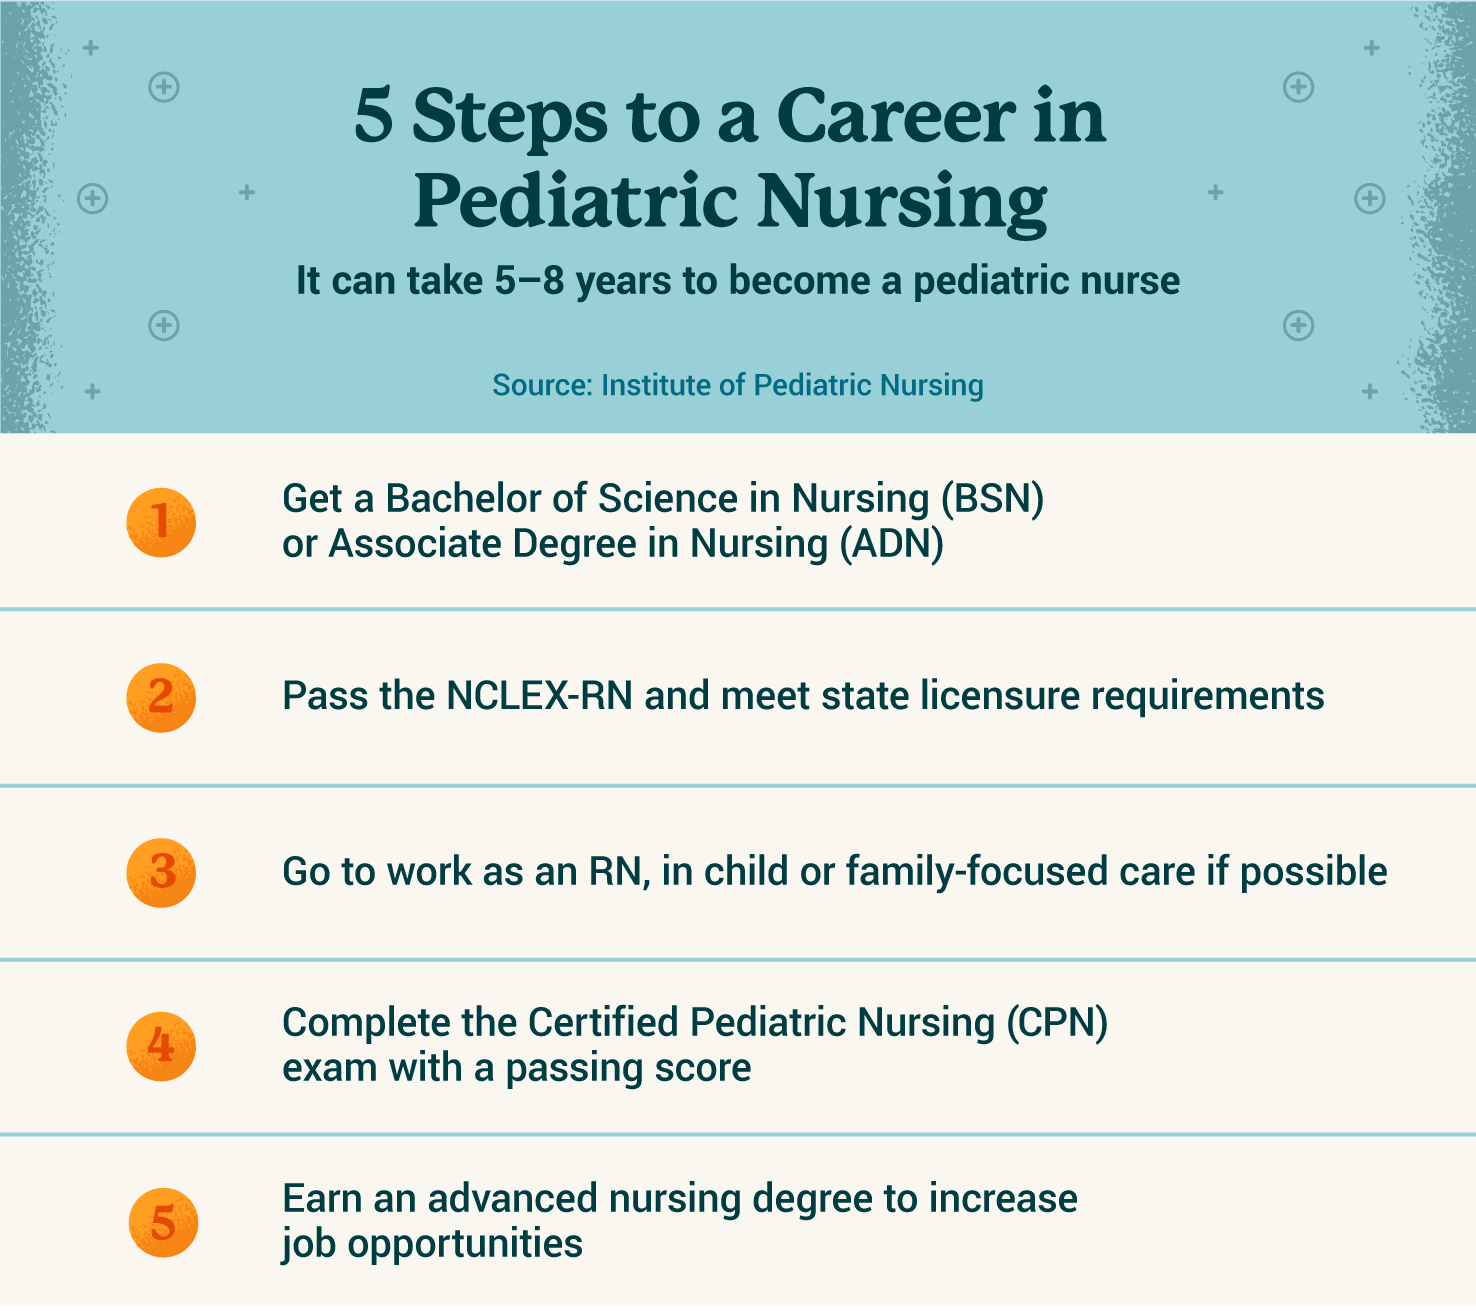 5 steps to career in pediatric nursing graphic